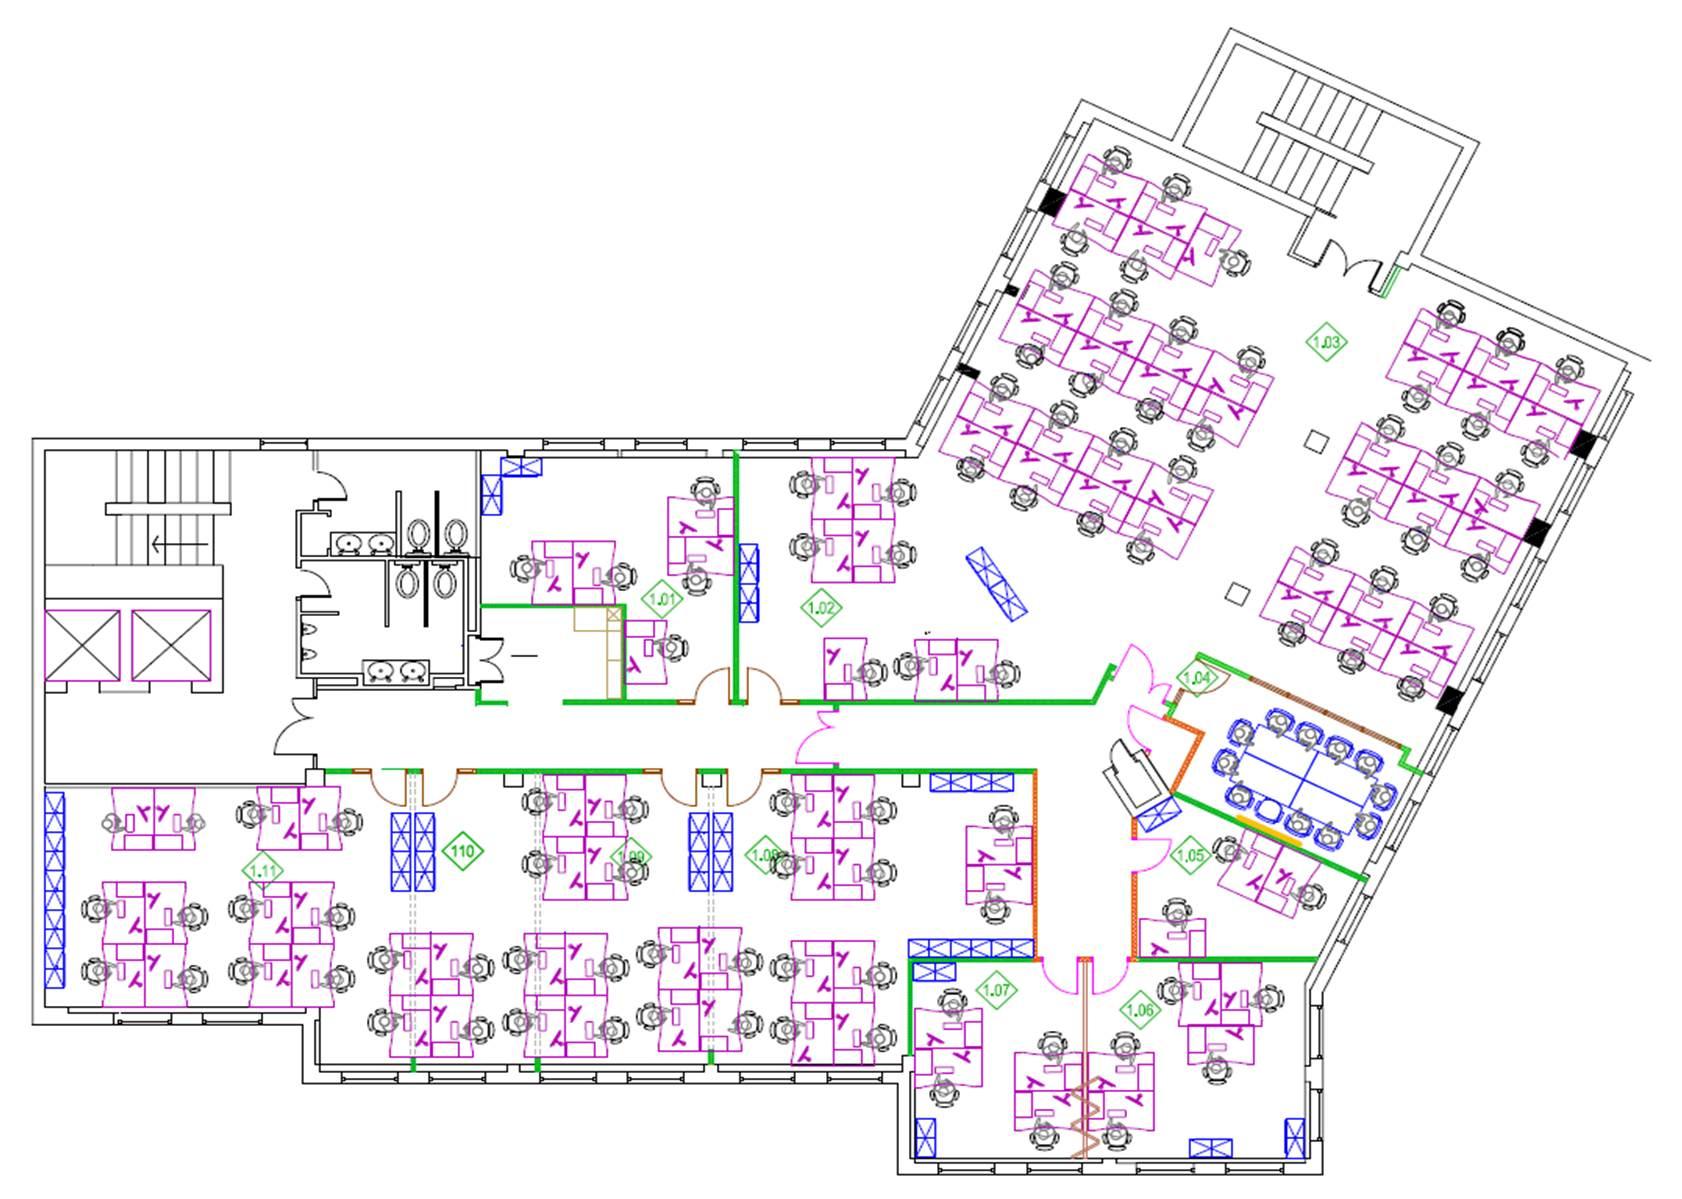 Reading serviced offices 23 duke street rg1 4sa for Reading a floor plan